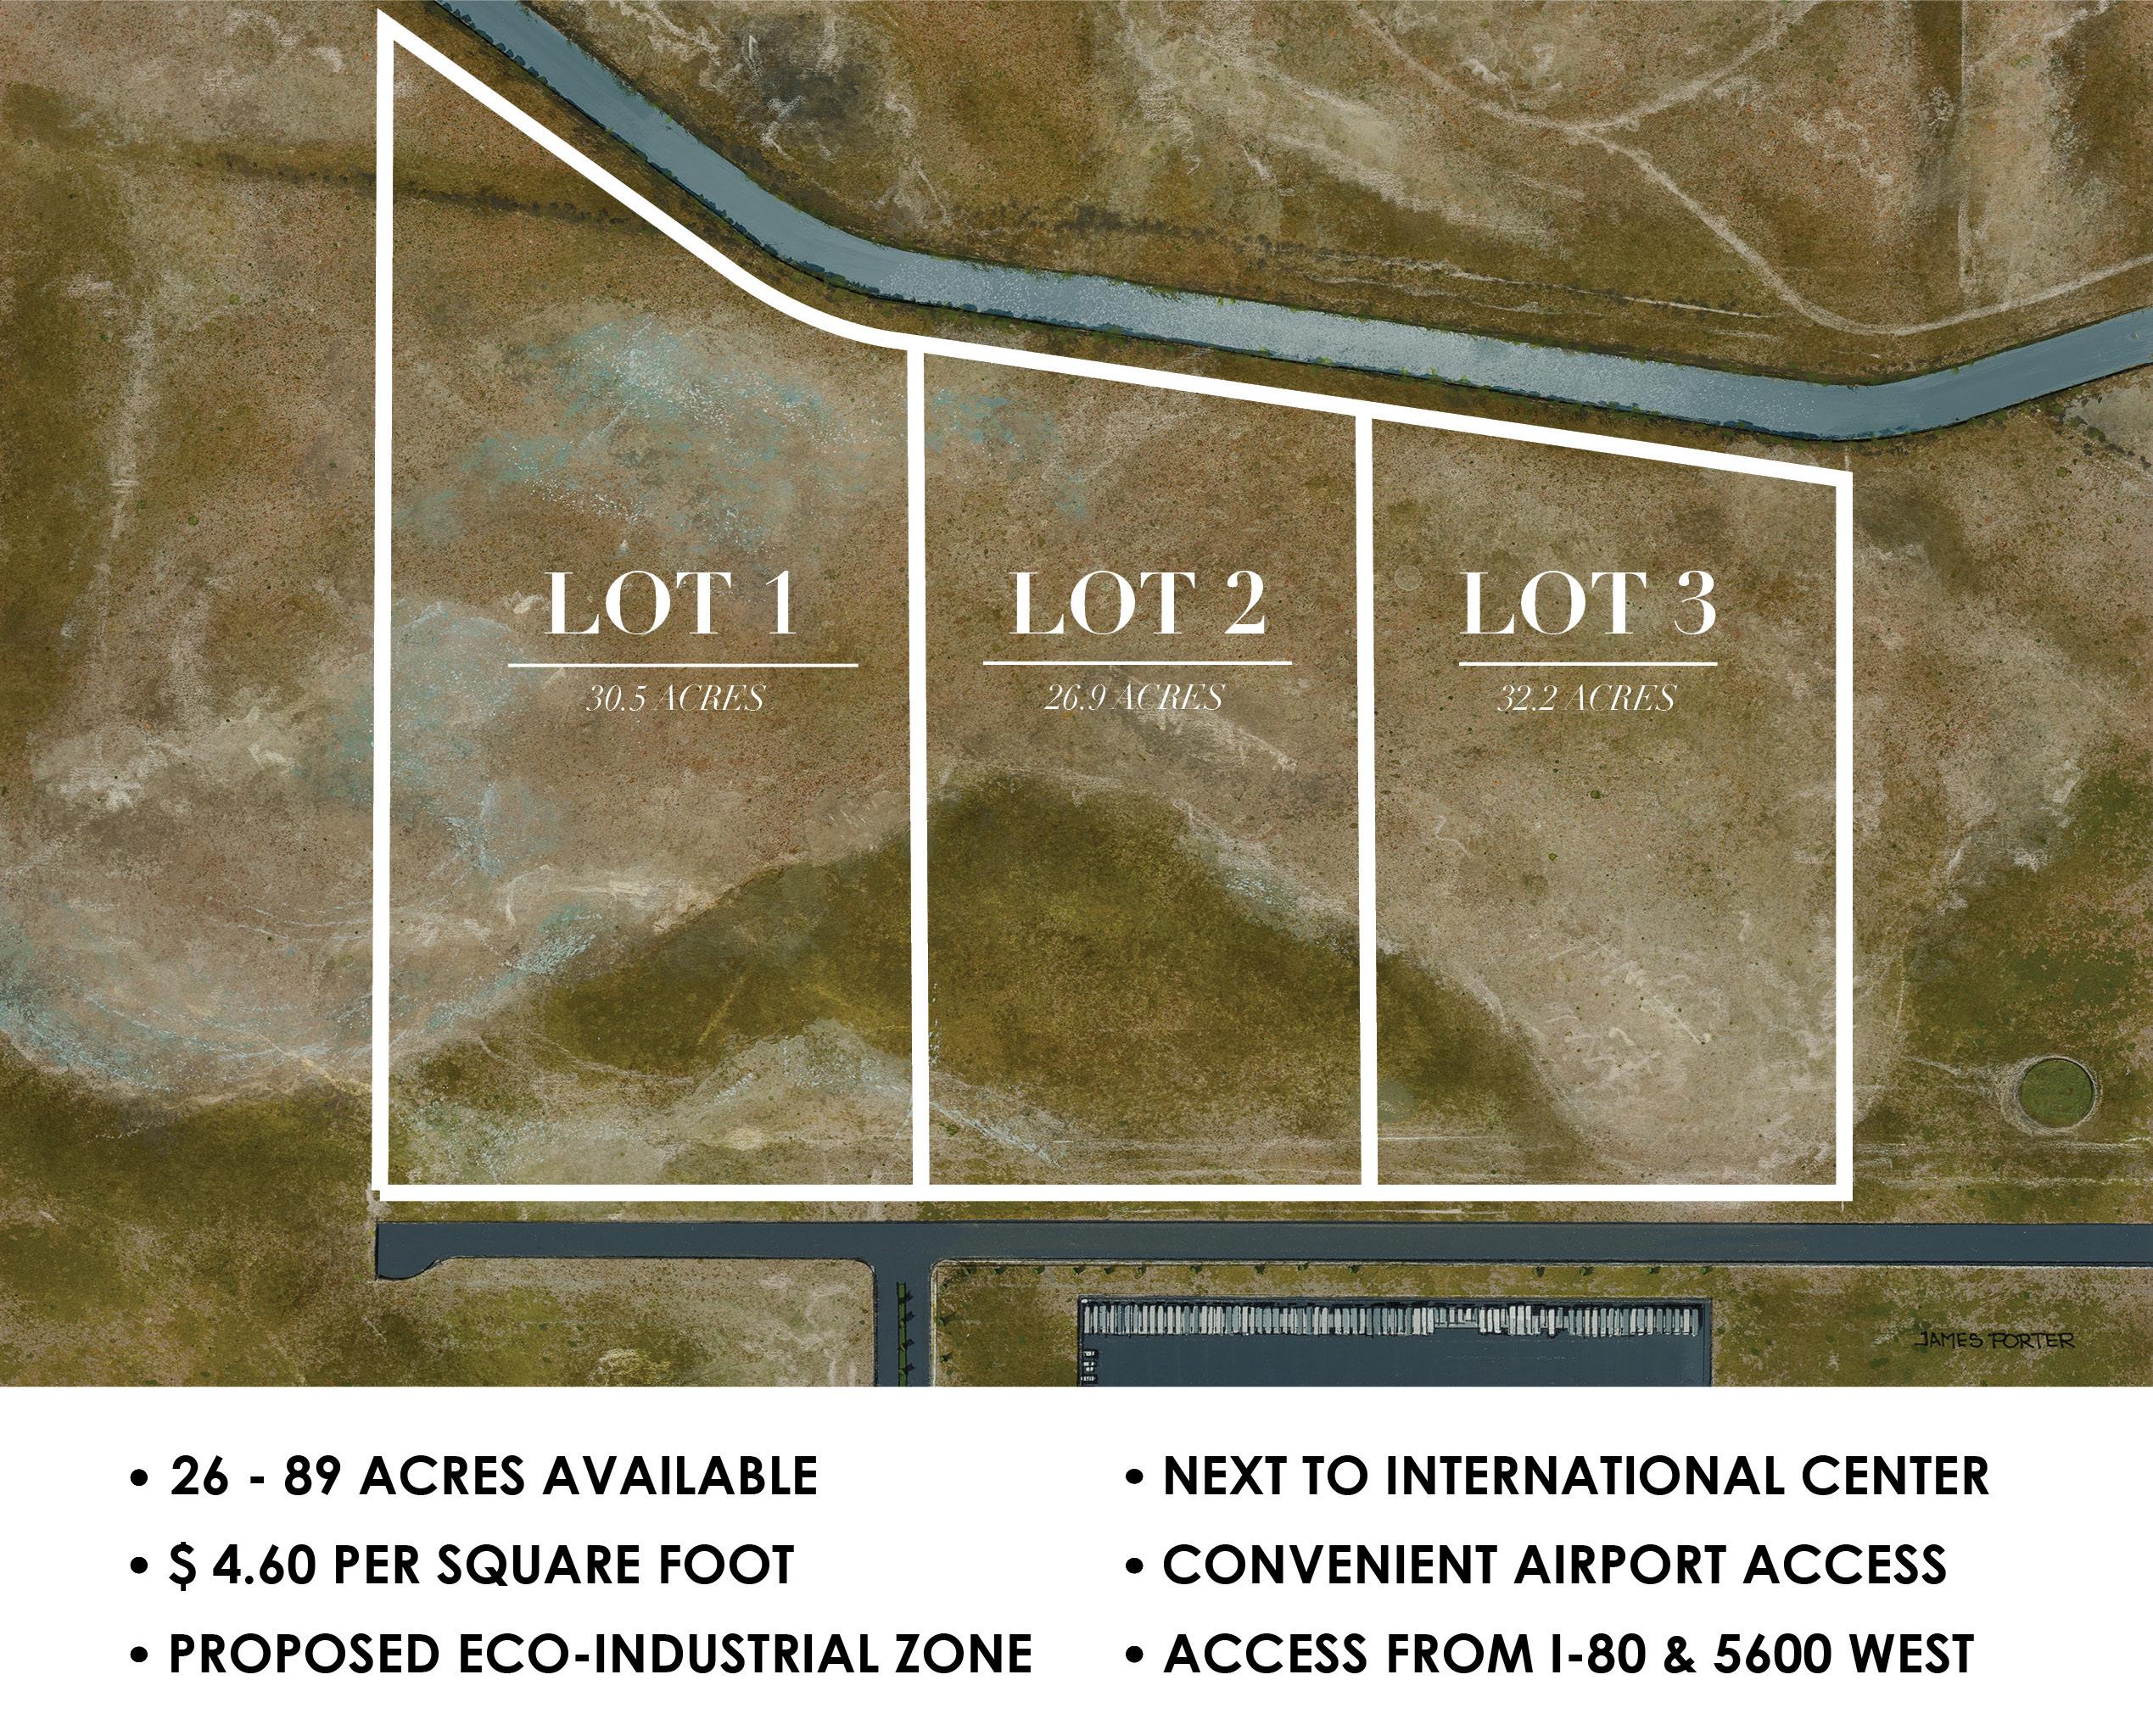 Windermere-Commercial-Real-Estate-Land-Represenation-Salt-Lake-City-John-Cannon-DriveFLYER